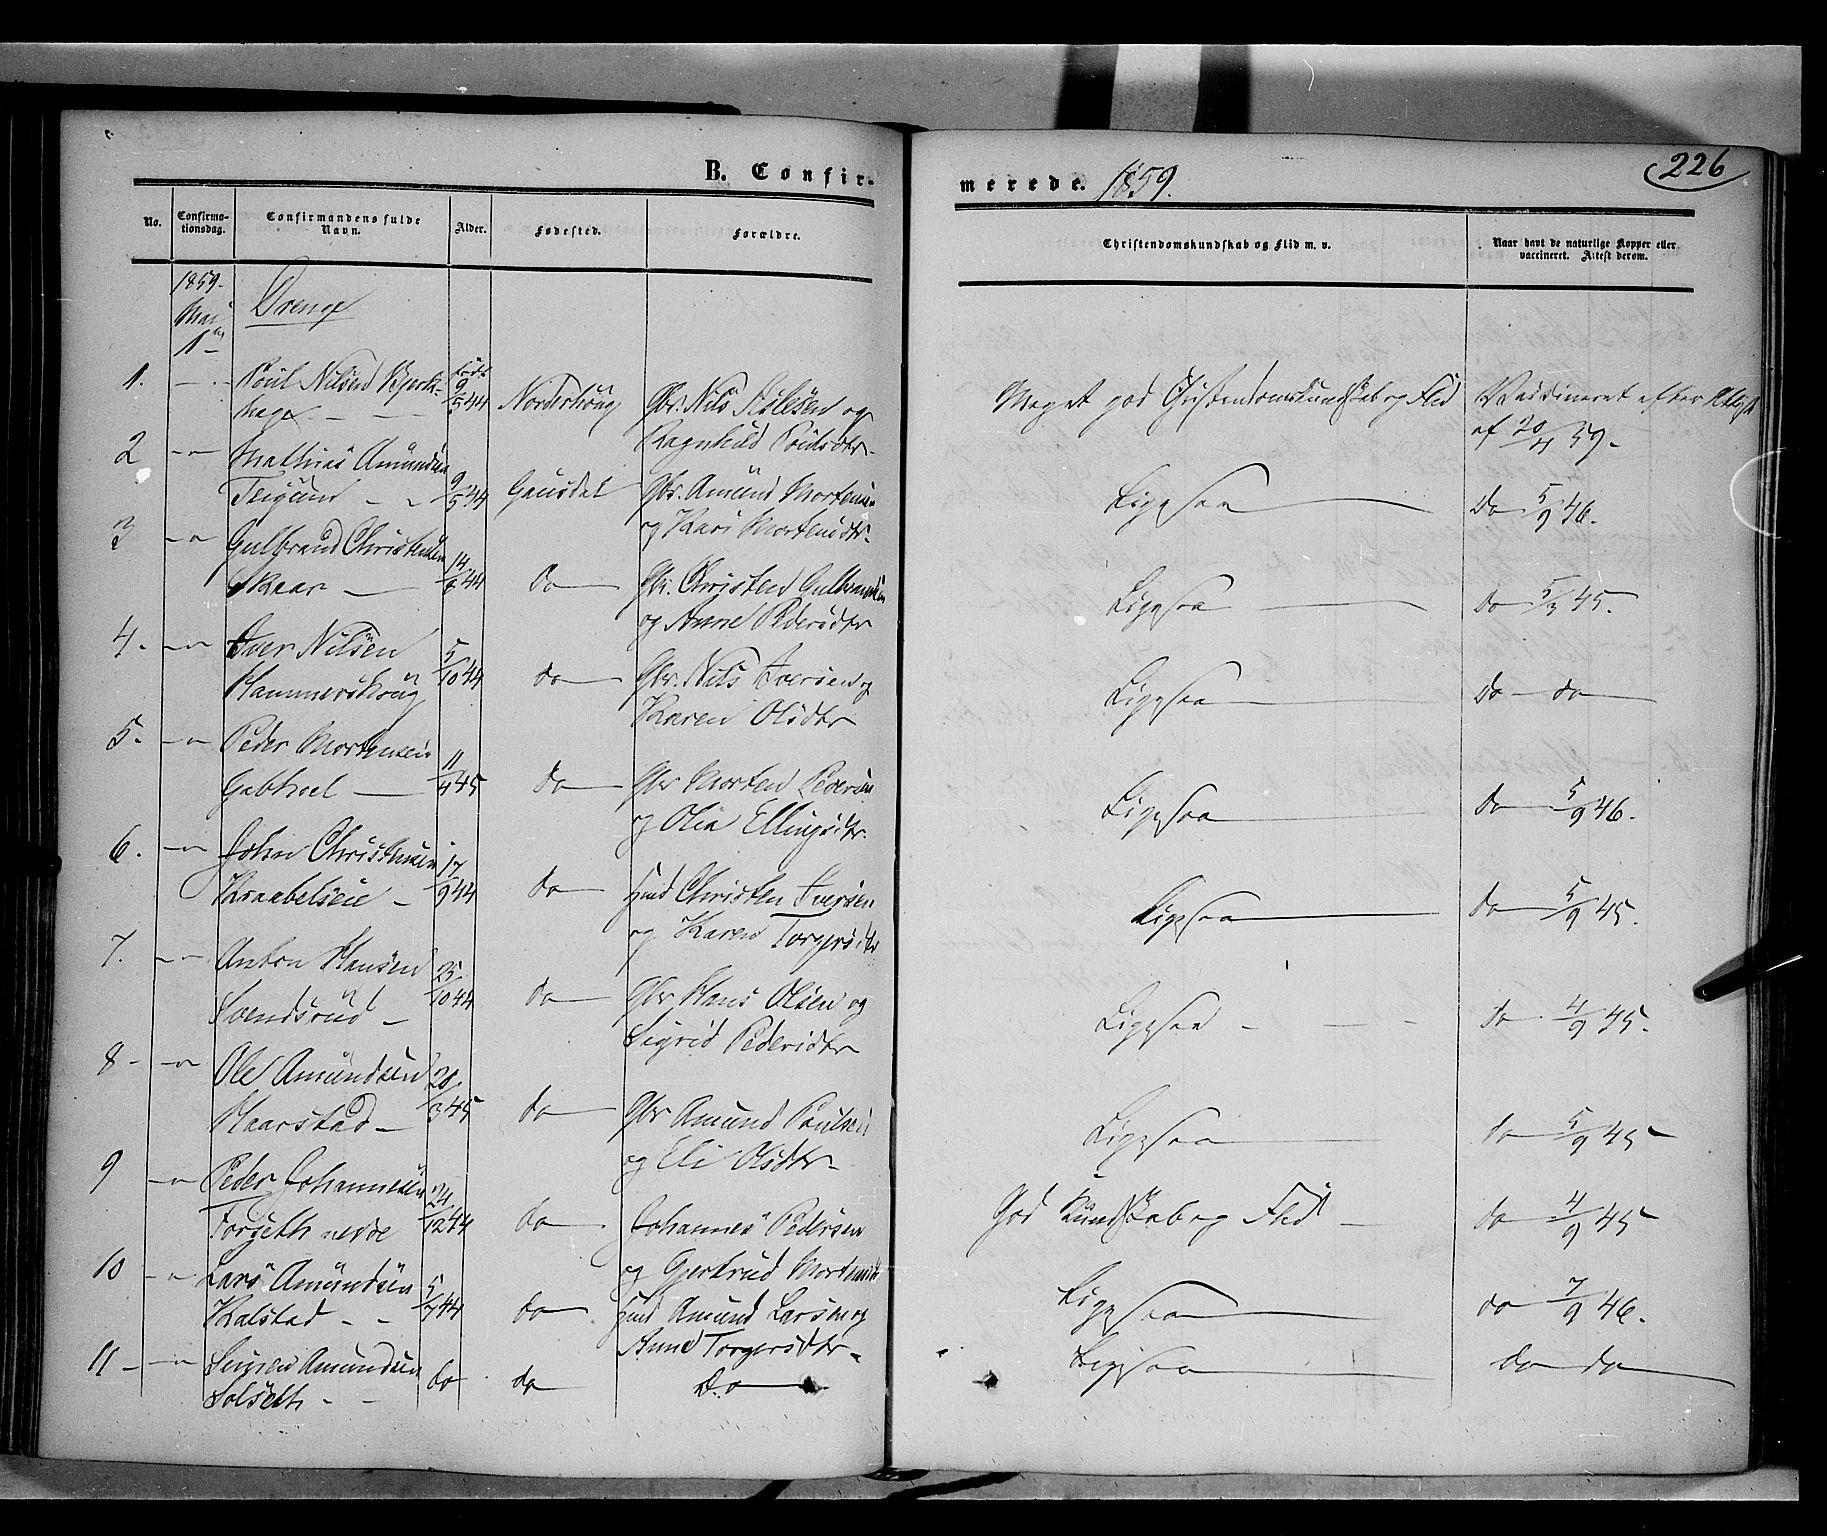 SAH, Gausdal prestekontor, Ministerialbok nr. 8, 1850-1861, s. 226